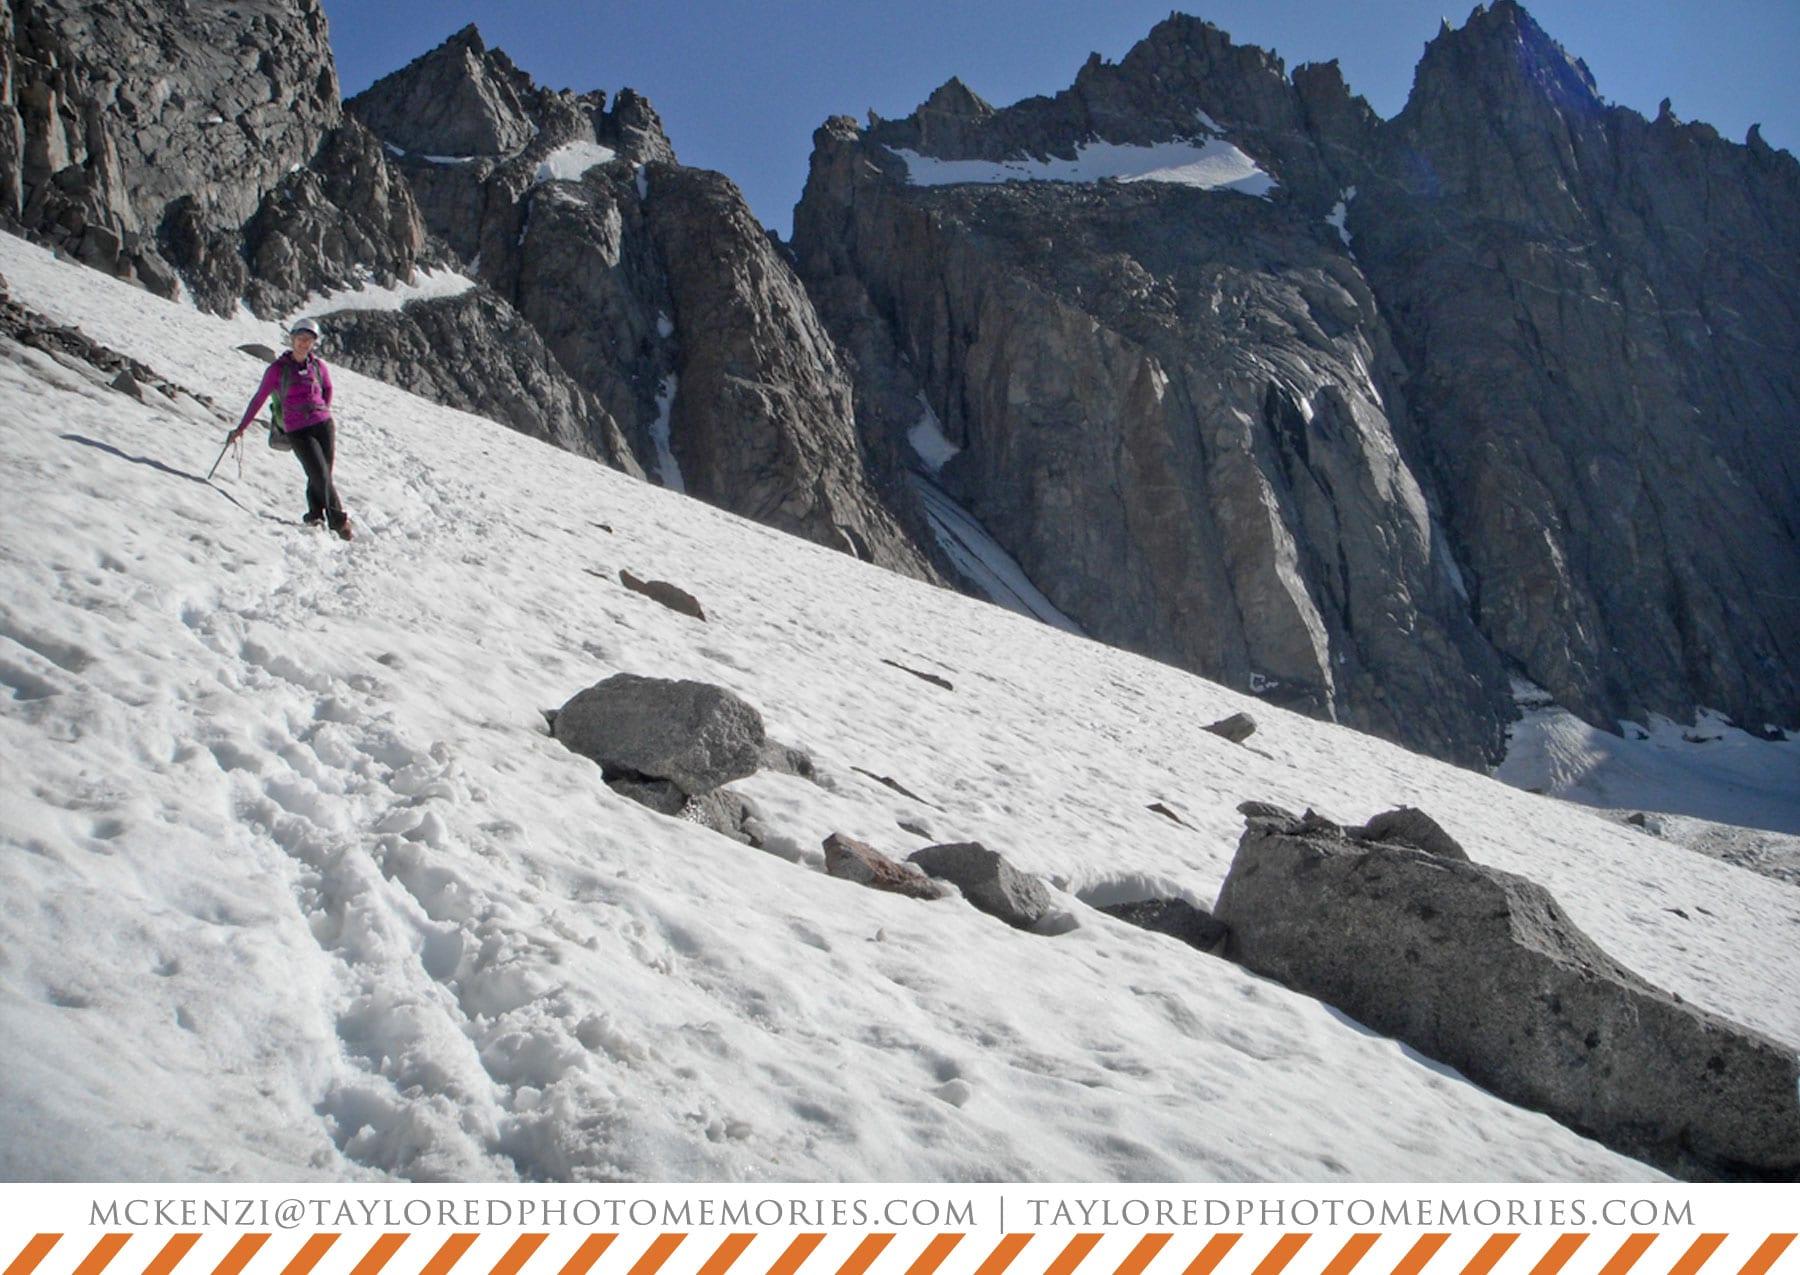 Rock Climbing Mt. Sill